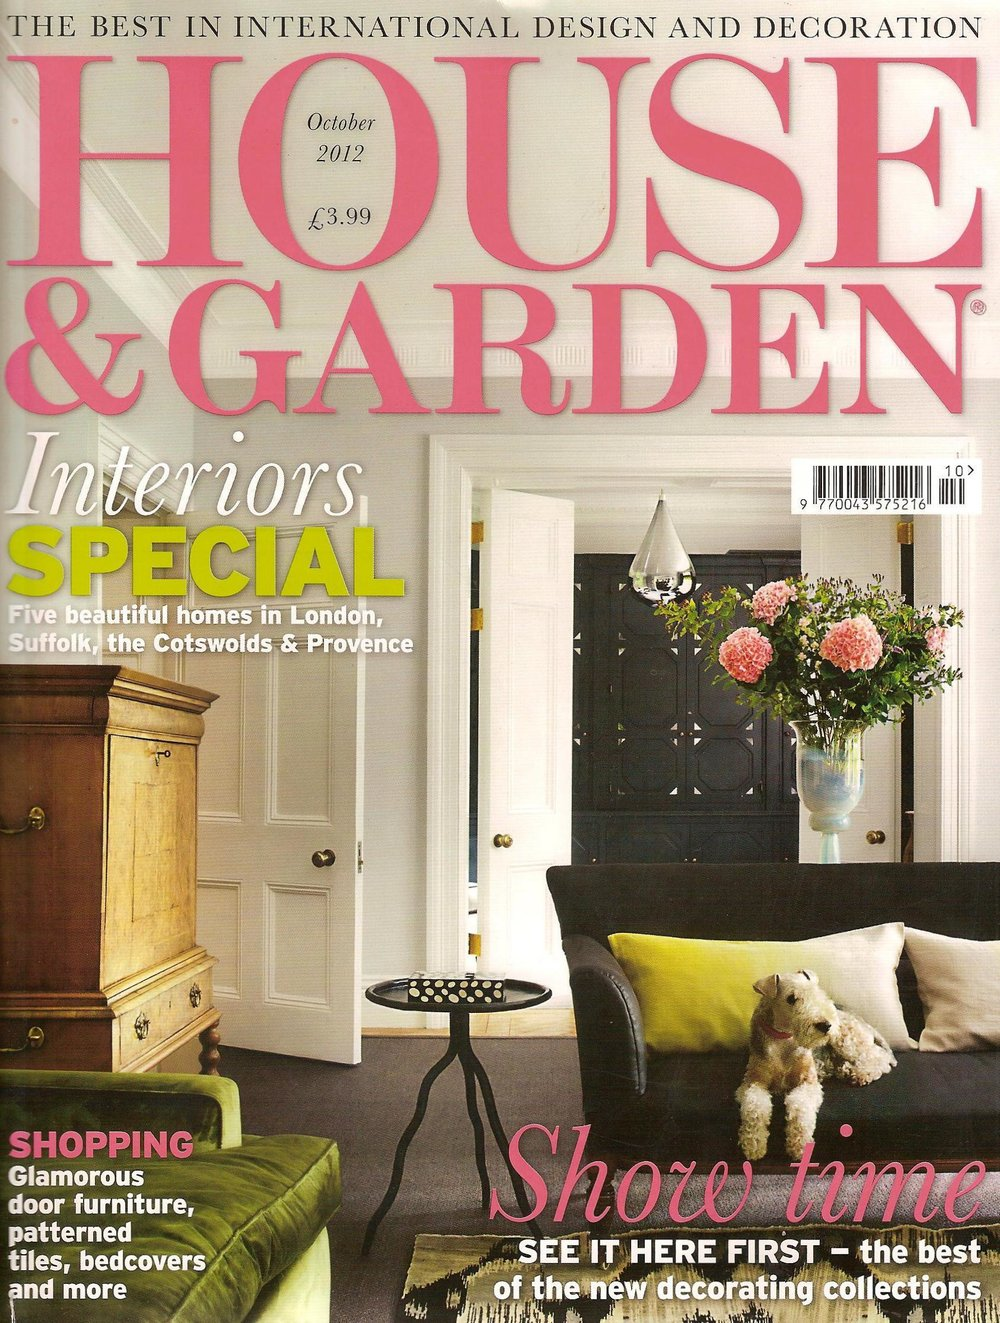 House and Garden Cover.jpg